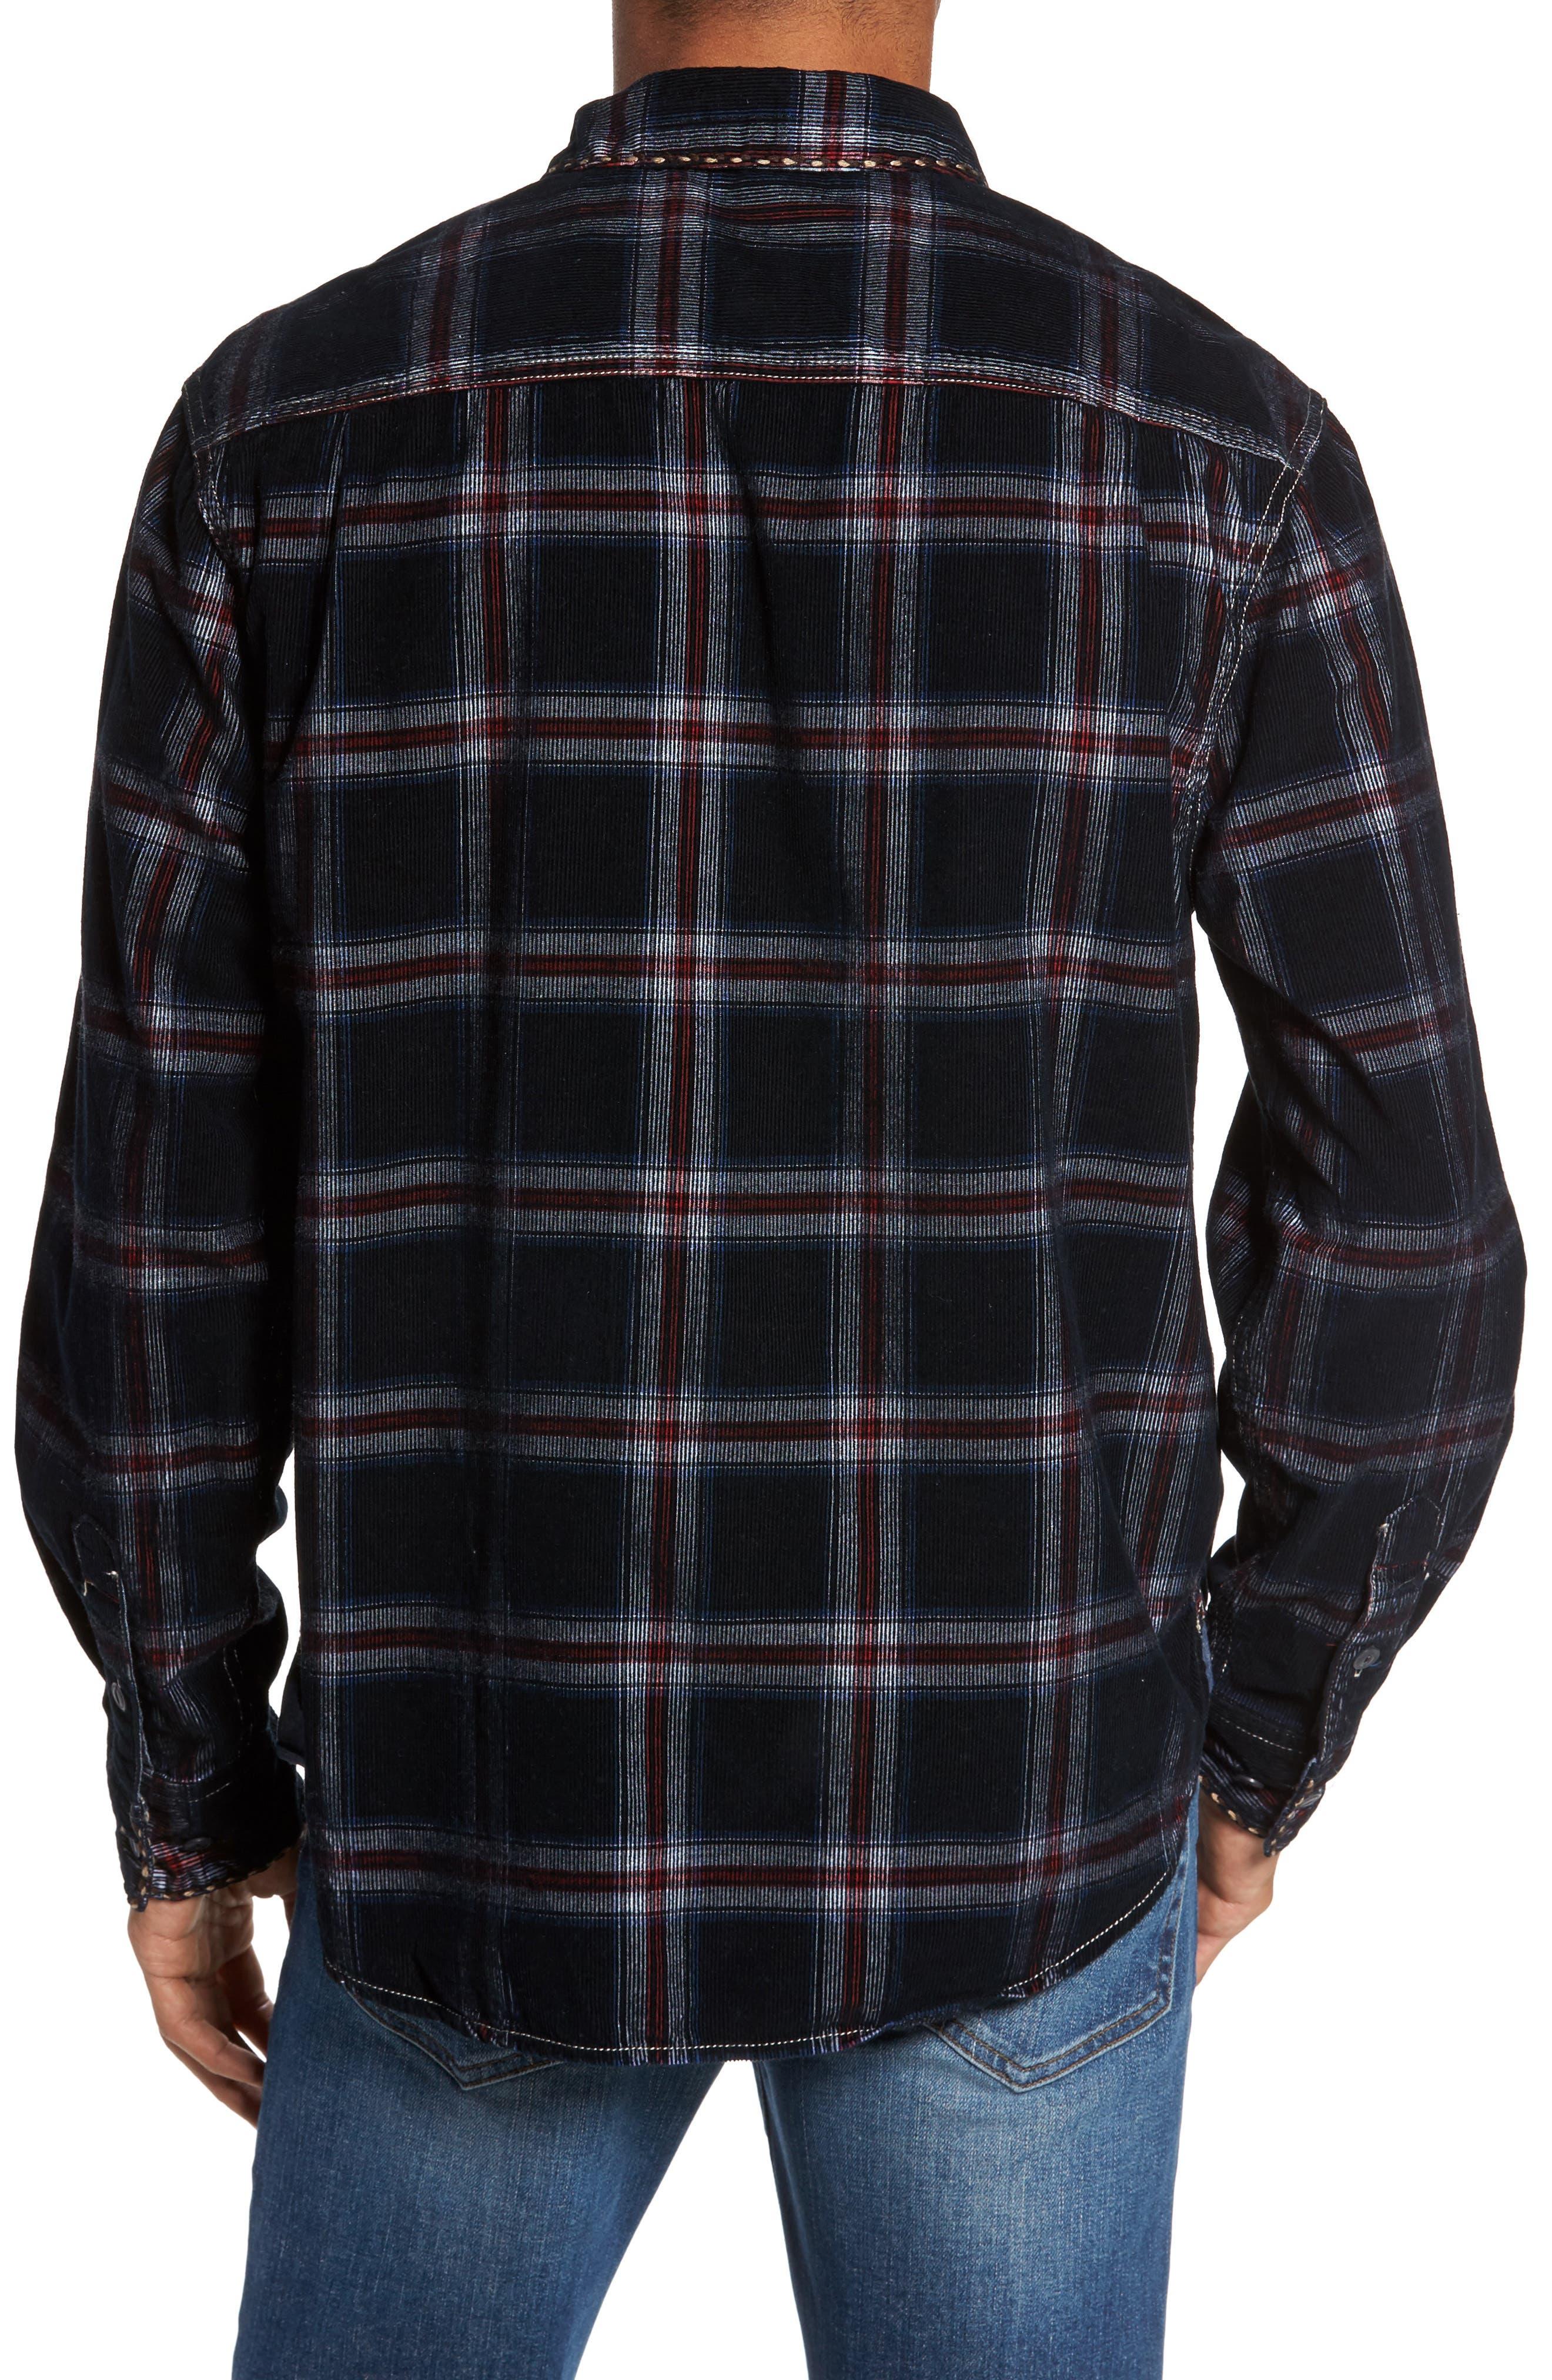 Summit Hunter Plaid Faux Shearling Lined Shirt Jacket,                             Alternate thumbnail 2, color,                             001